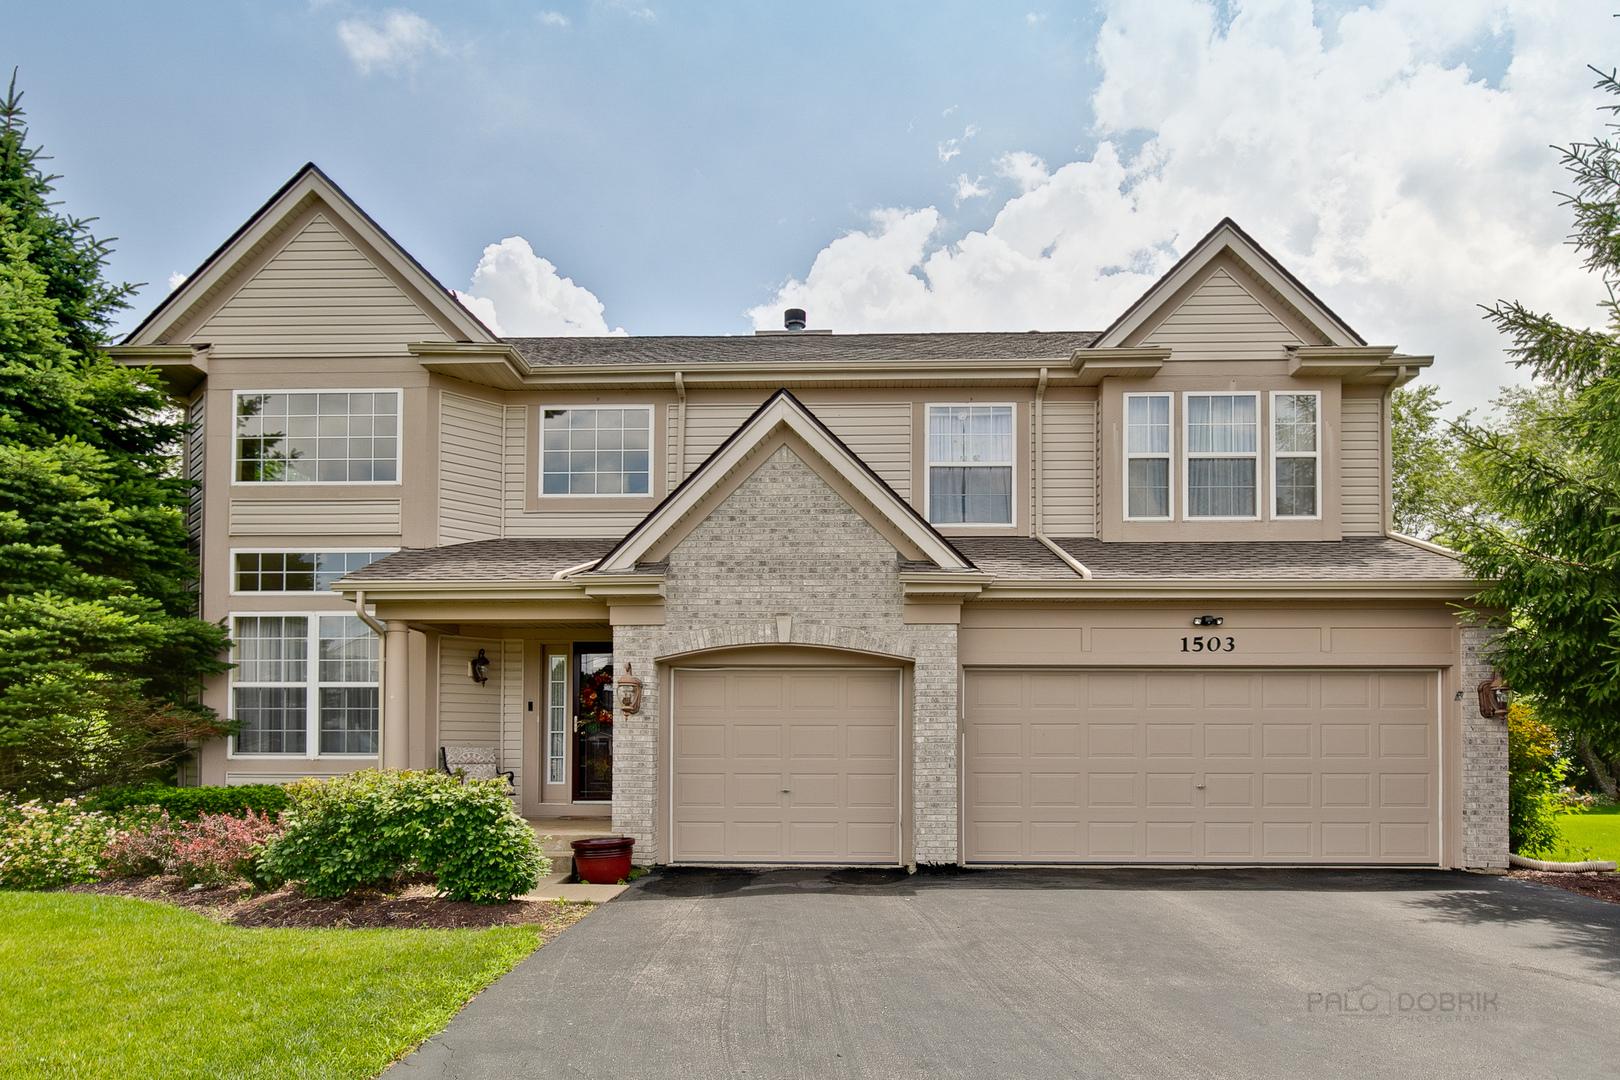 1503 Summerhill Lane, Cary, IL 60013